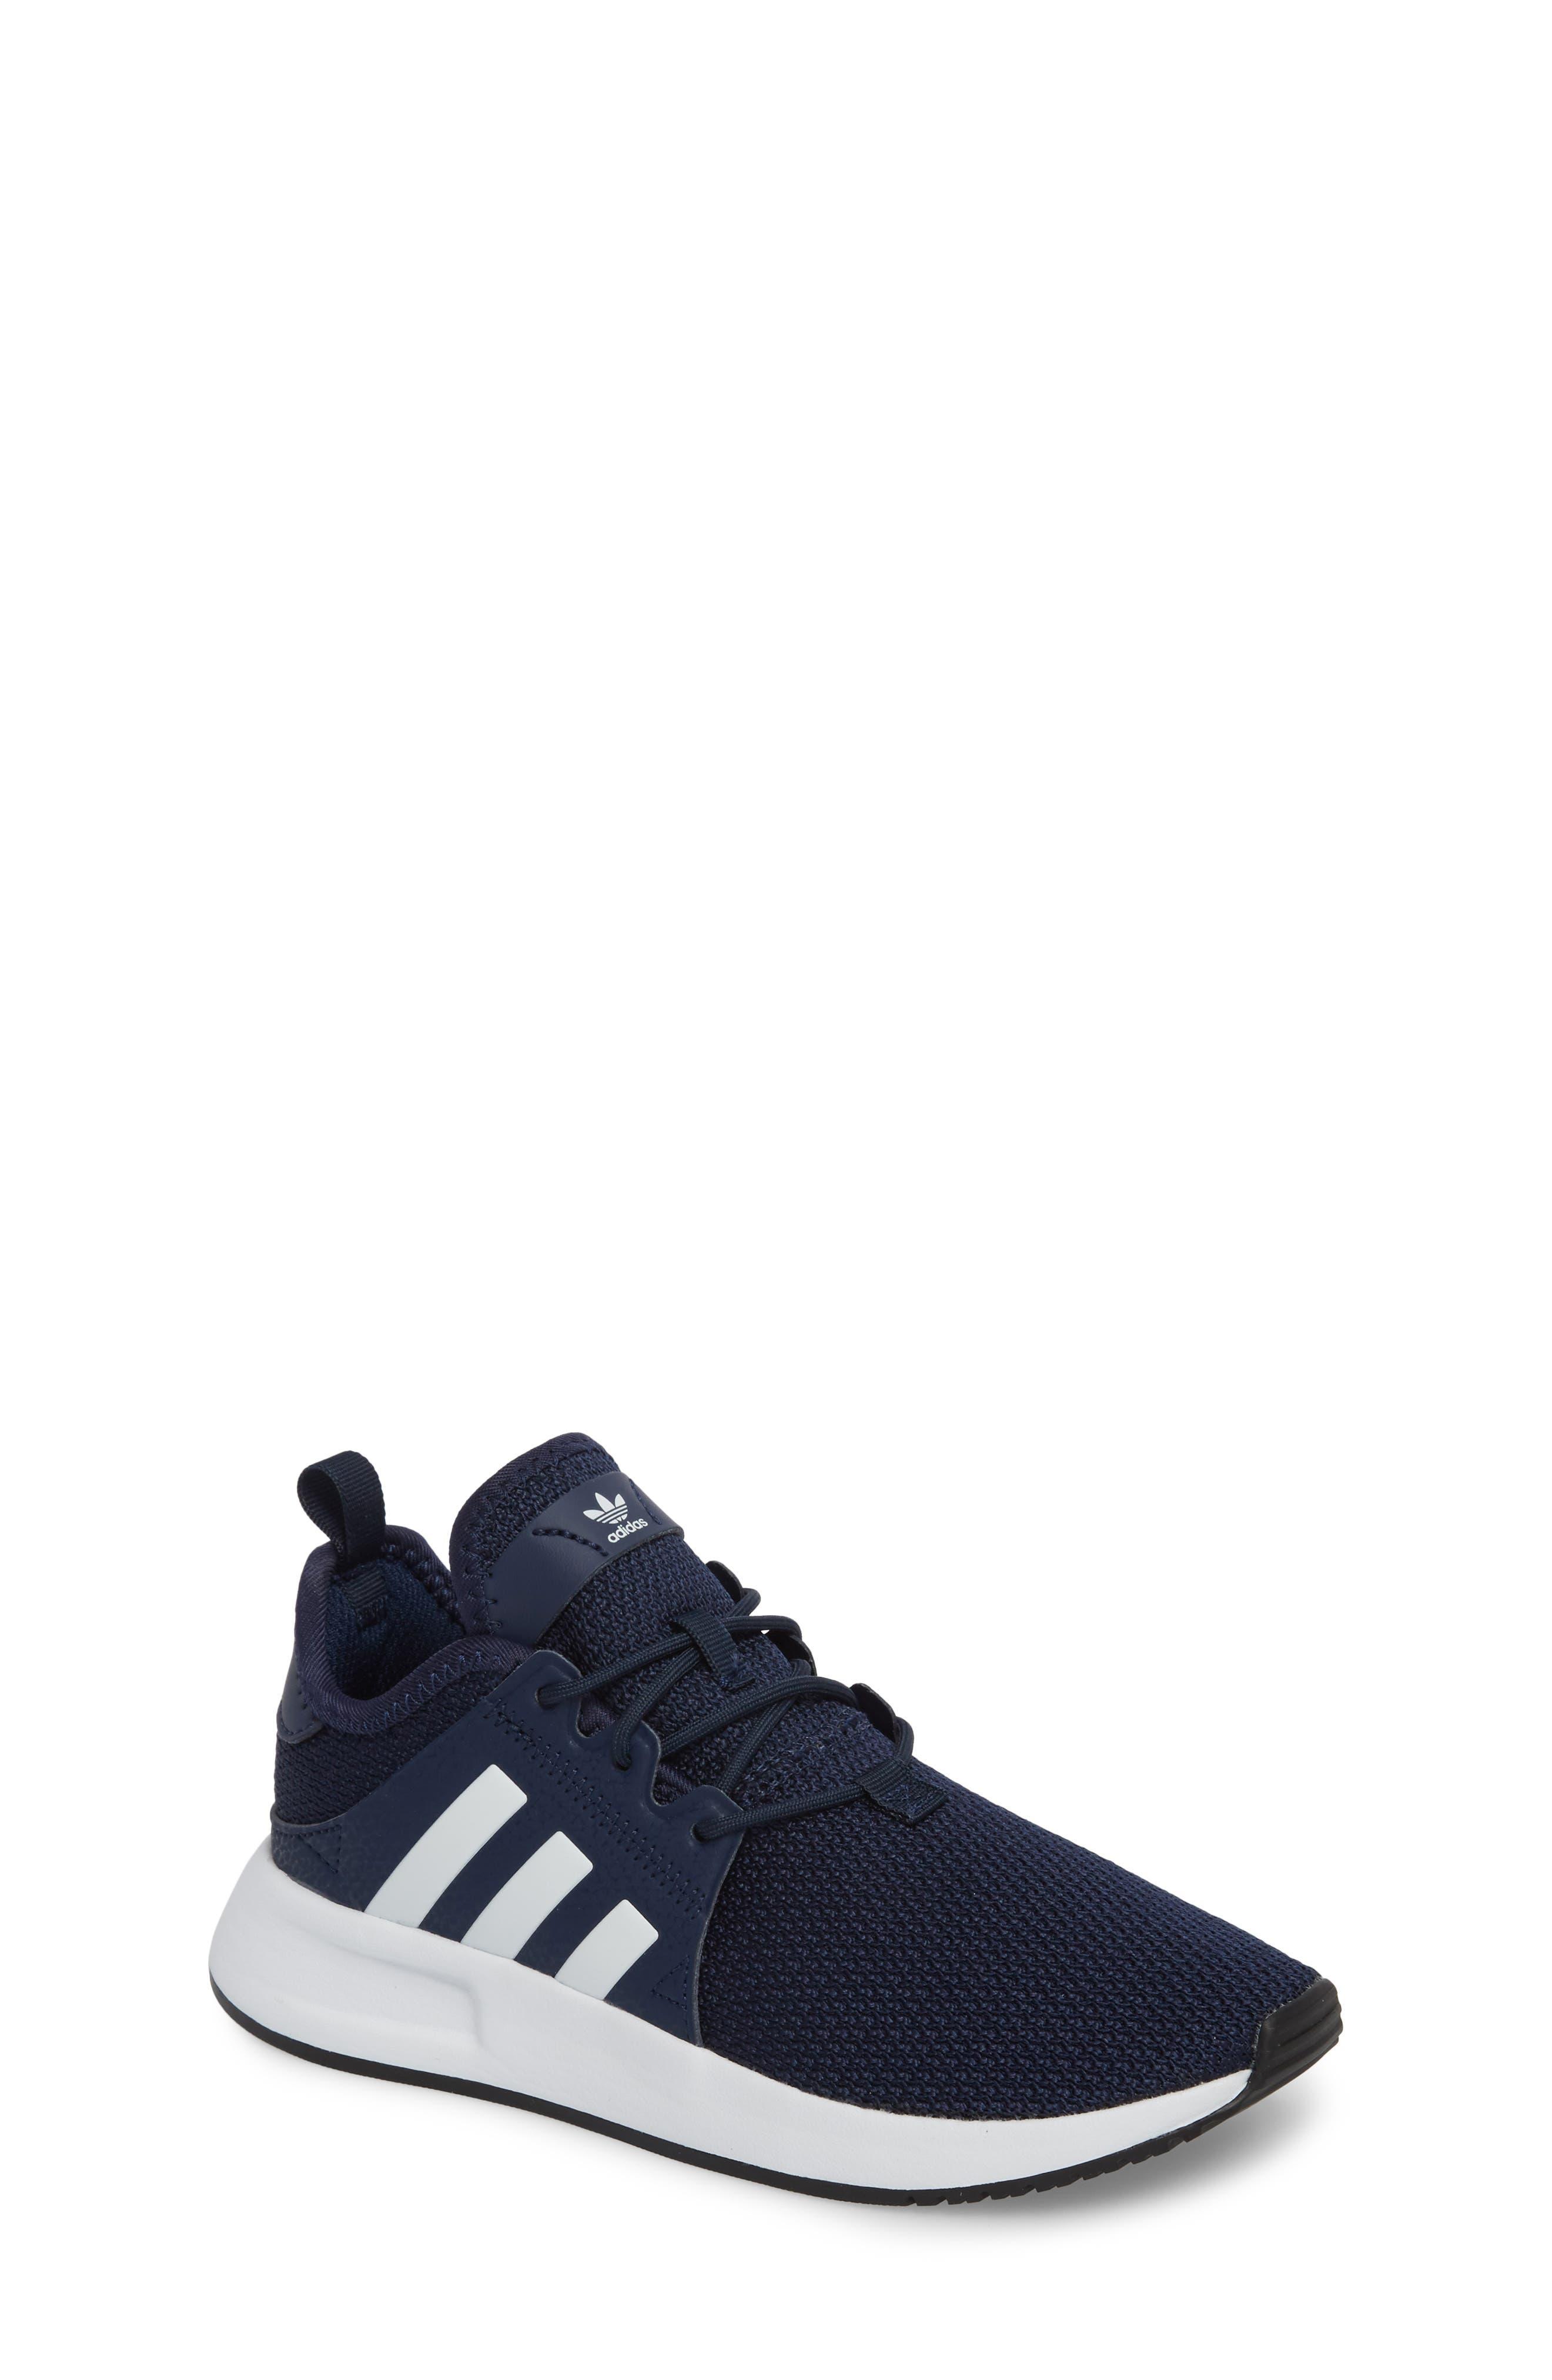 ADIDAS X_PLR Sneaker, Main, color, COLLEGIATE NAVY/ WHITE